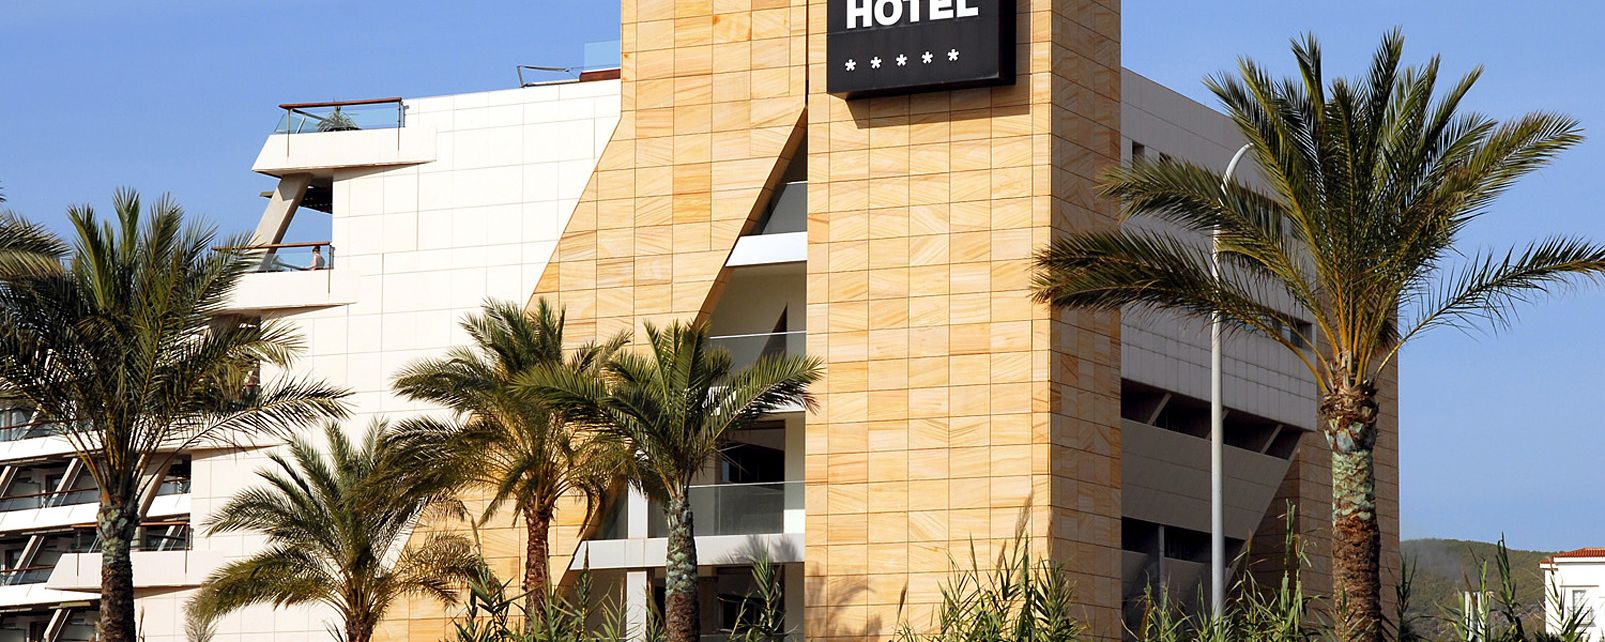 Hotel Ibiza Grand Hotel